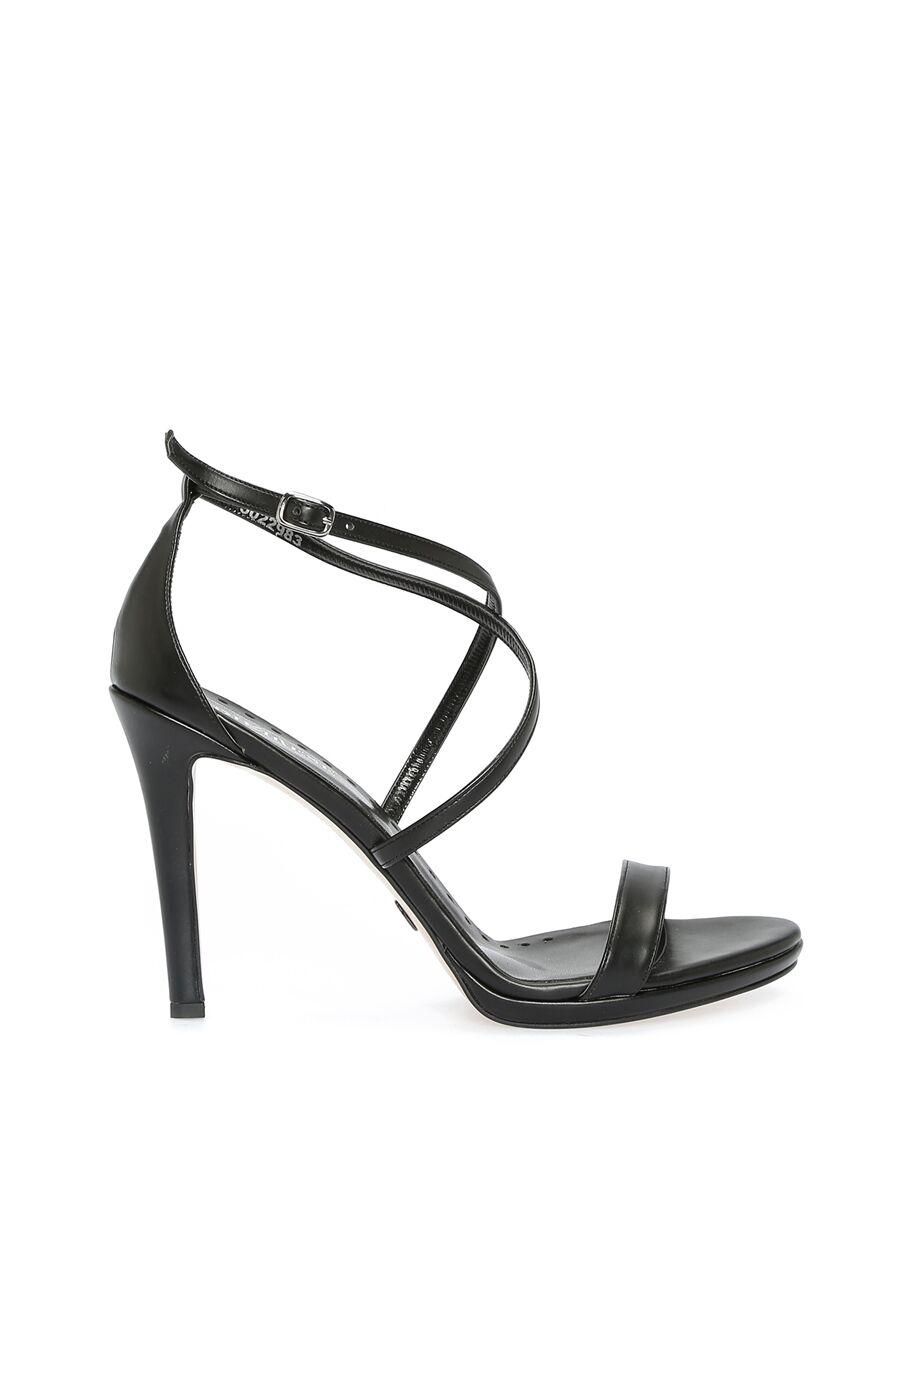 Dıvarese Siyah Sandalet – 399.0 TL